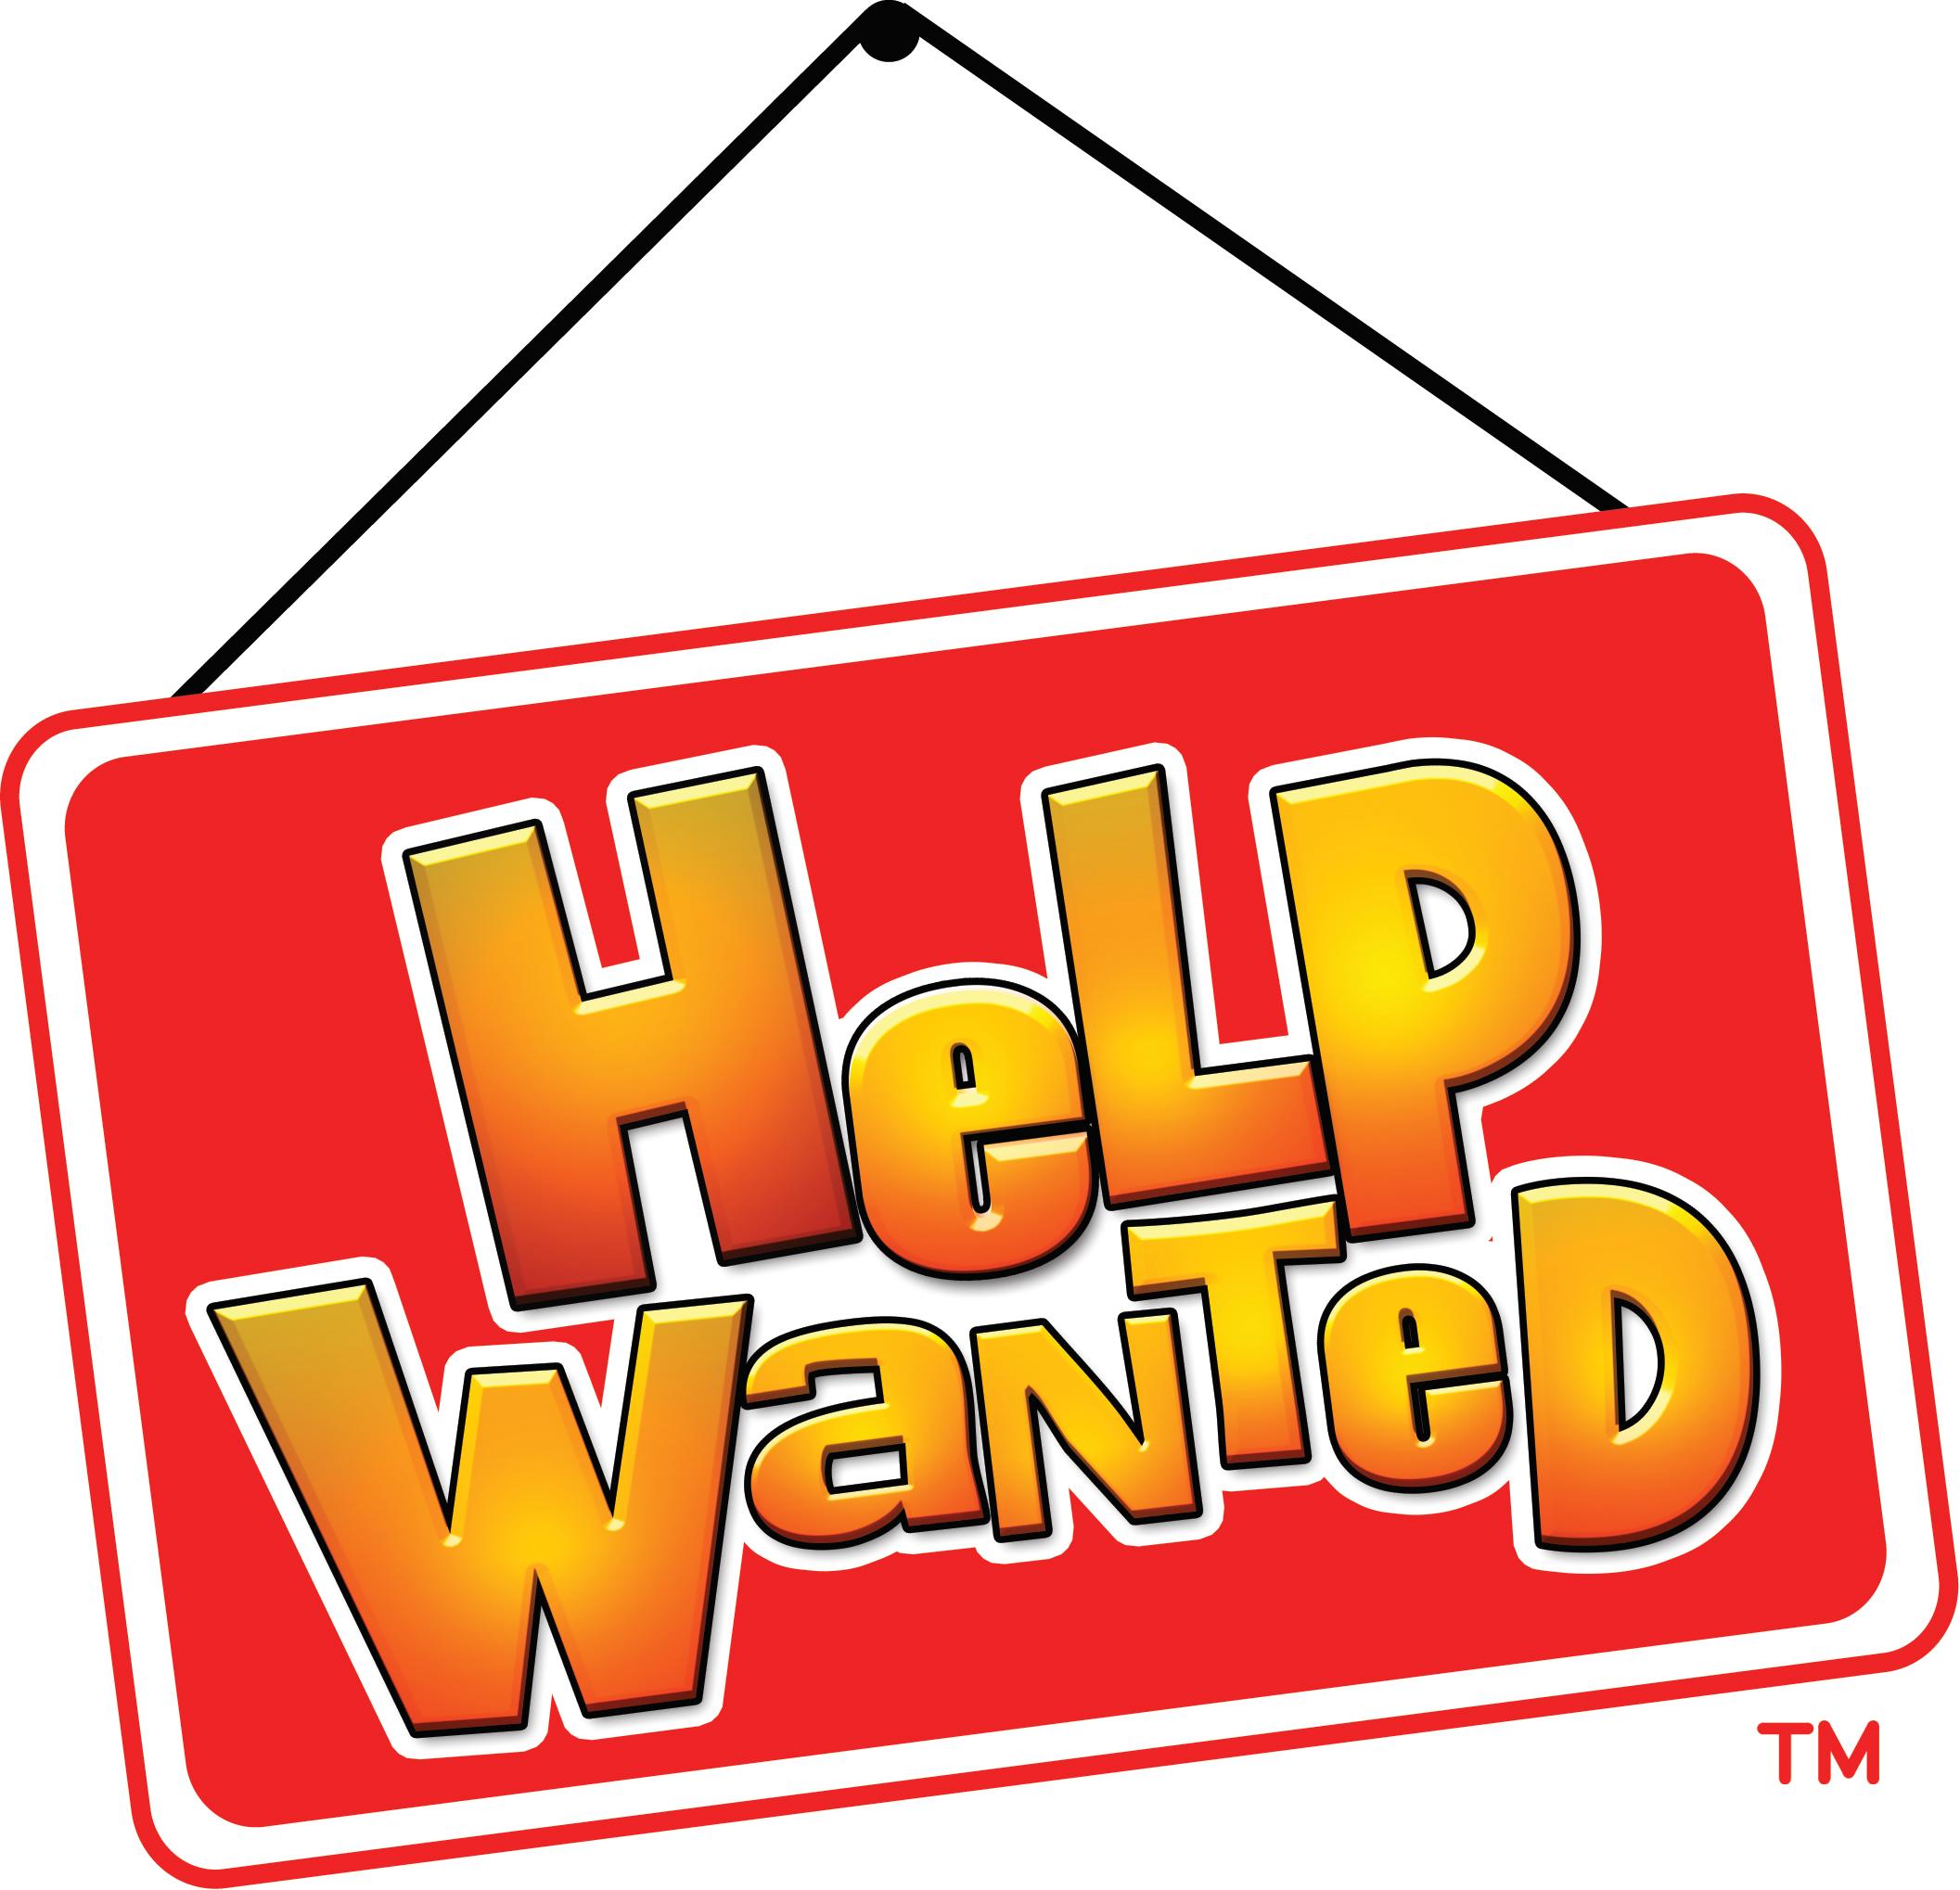 Help Clipart Helpwanted Logo Tm2 Psd Jpg-Help Clipart Helpwanted Logo Tm2 Psd Jpgcopy Jpg-4